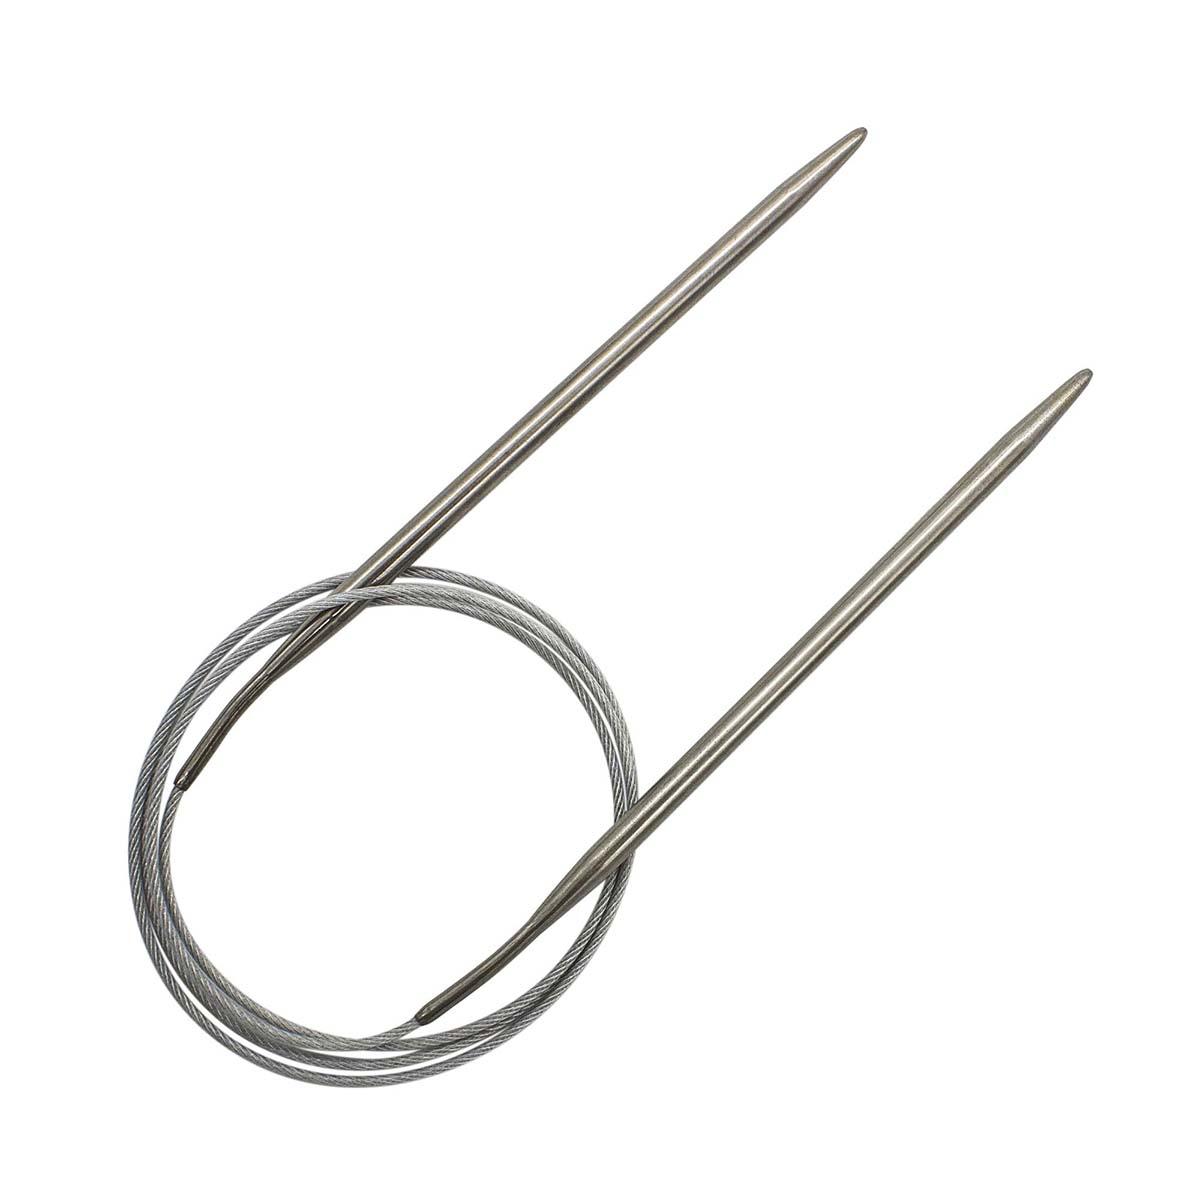 Спицы круговые металл 941150, 100 см, 5,0 мм, Hobby&Pro